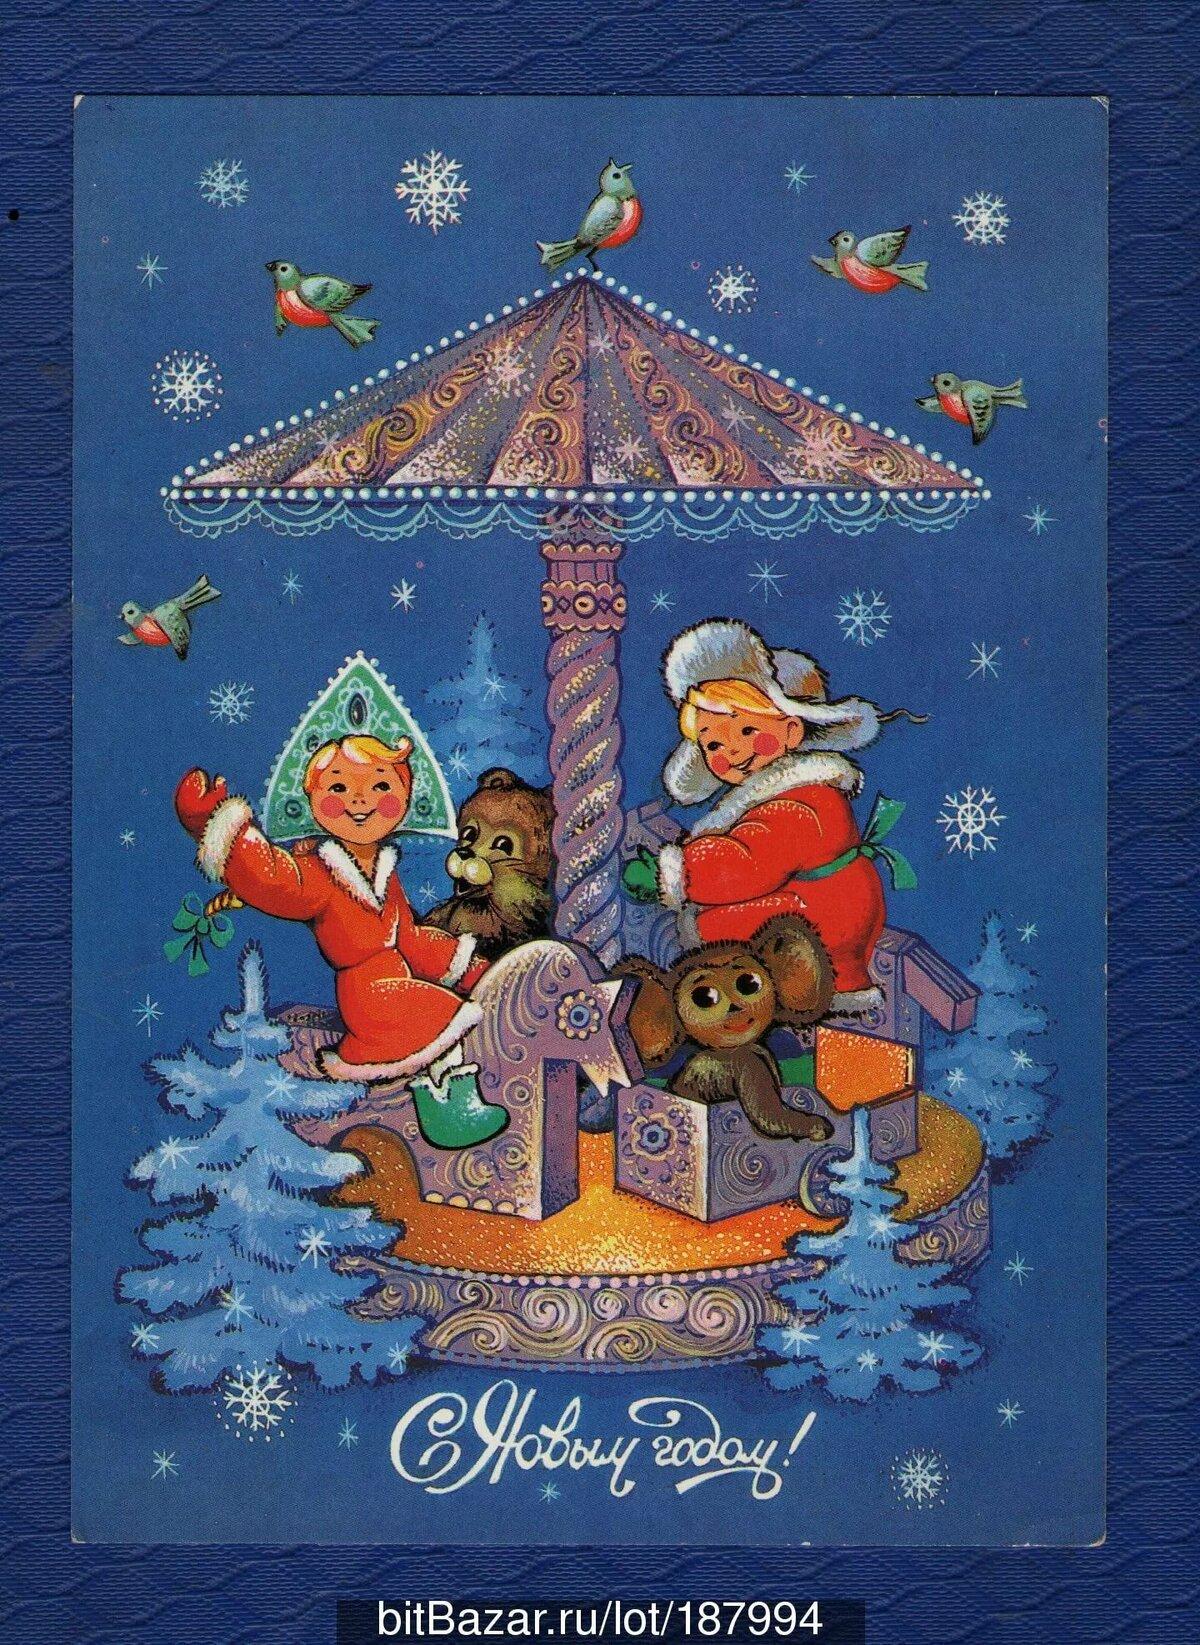 новогодние открытки за 2006 год фото видно